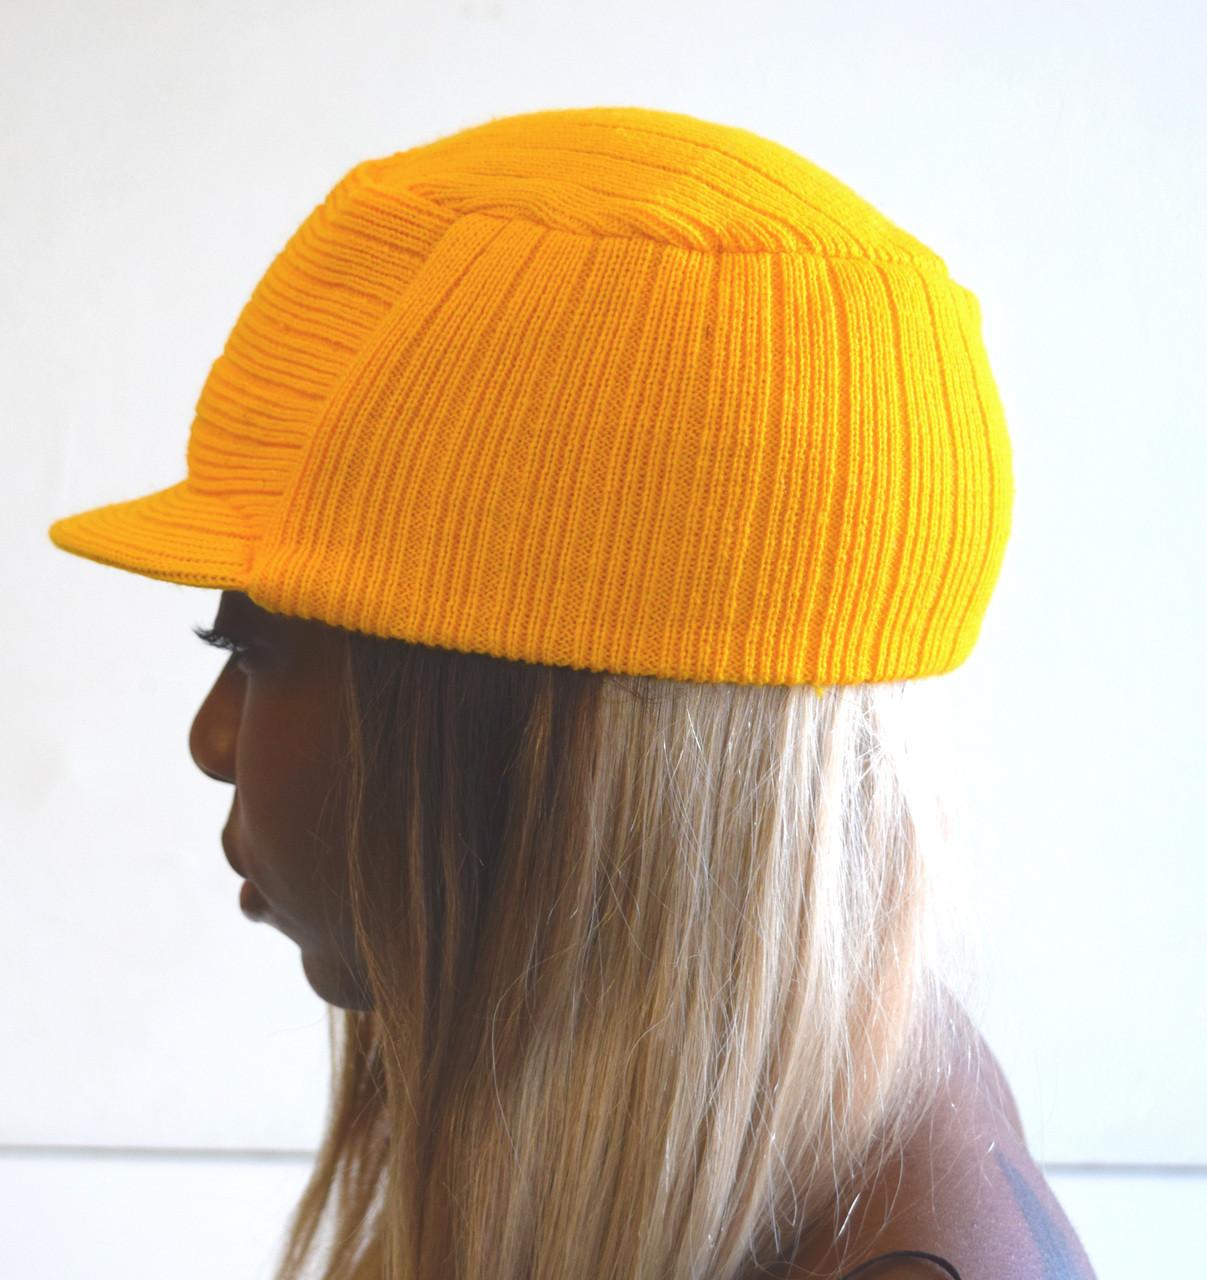 730f18b09f328 Yellow Knit Hat with Visor